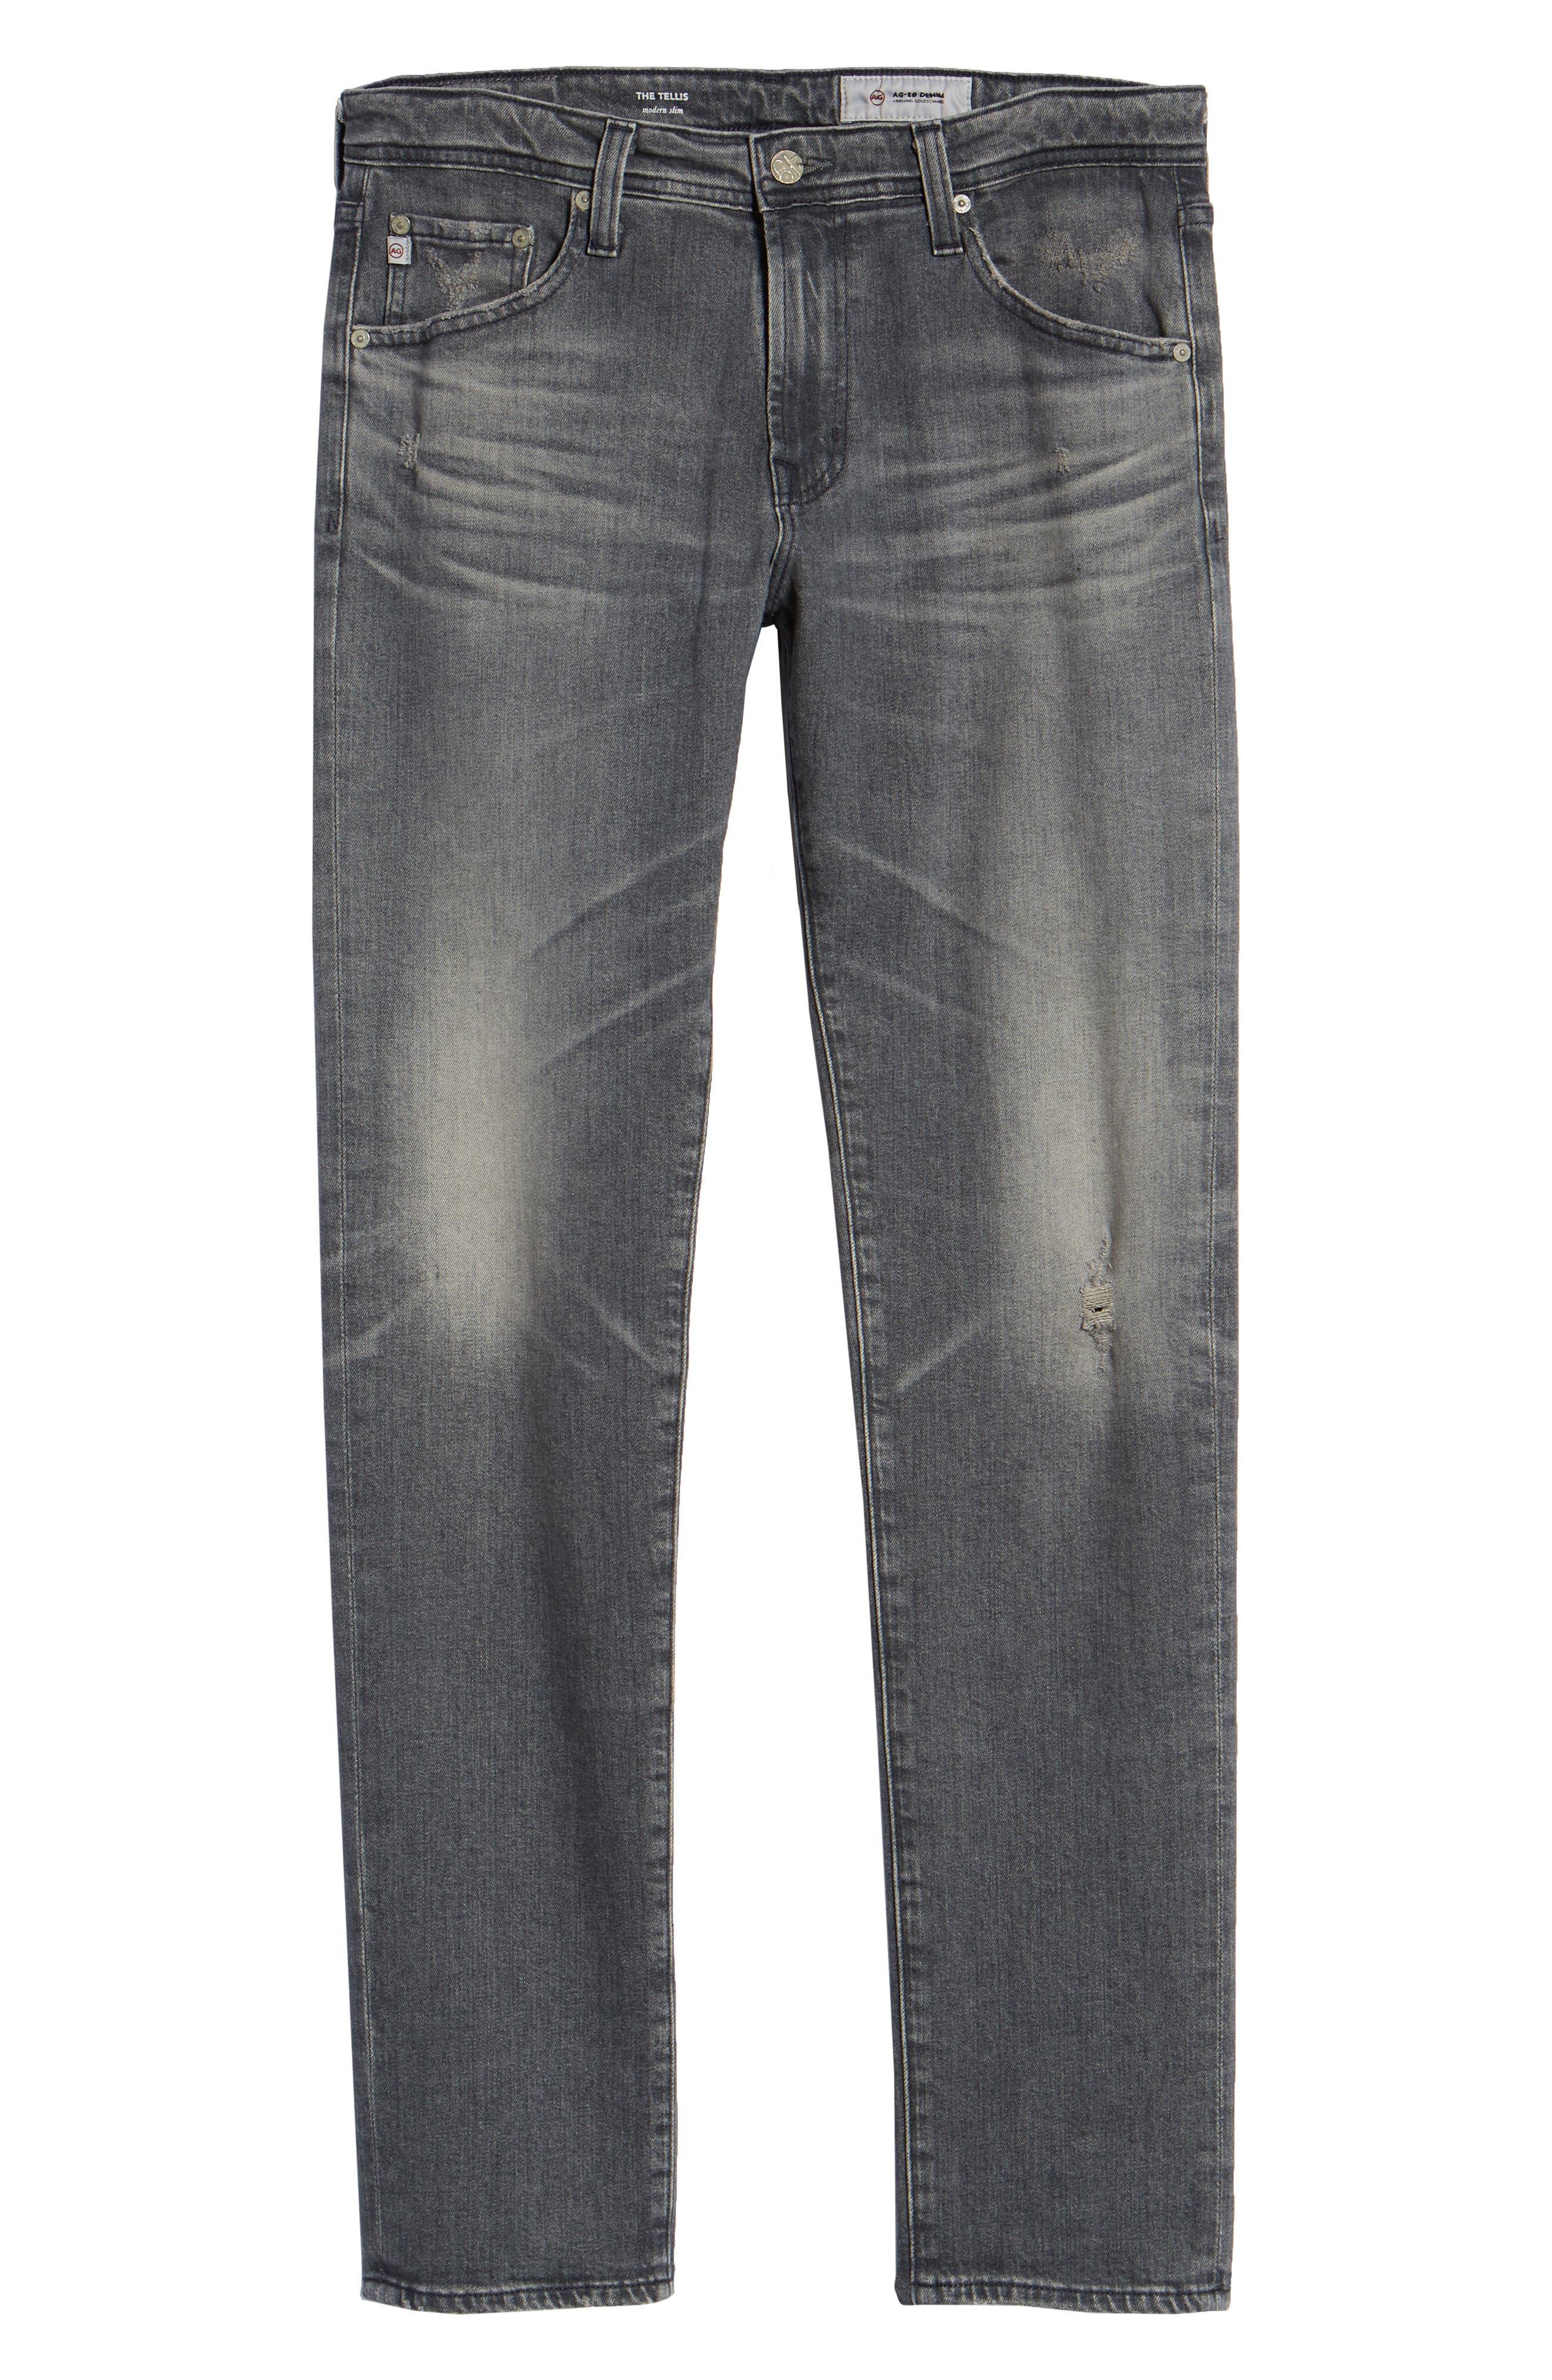 Tellis Slim Fit Jeans,                             Alternate thumbnail 6, color,                             8 YEARS CONJURE